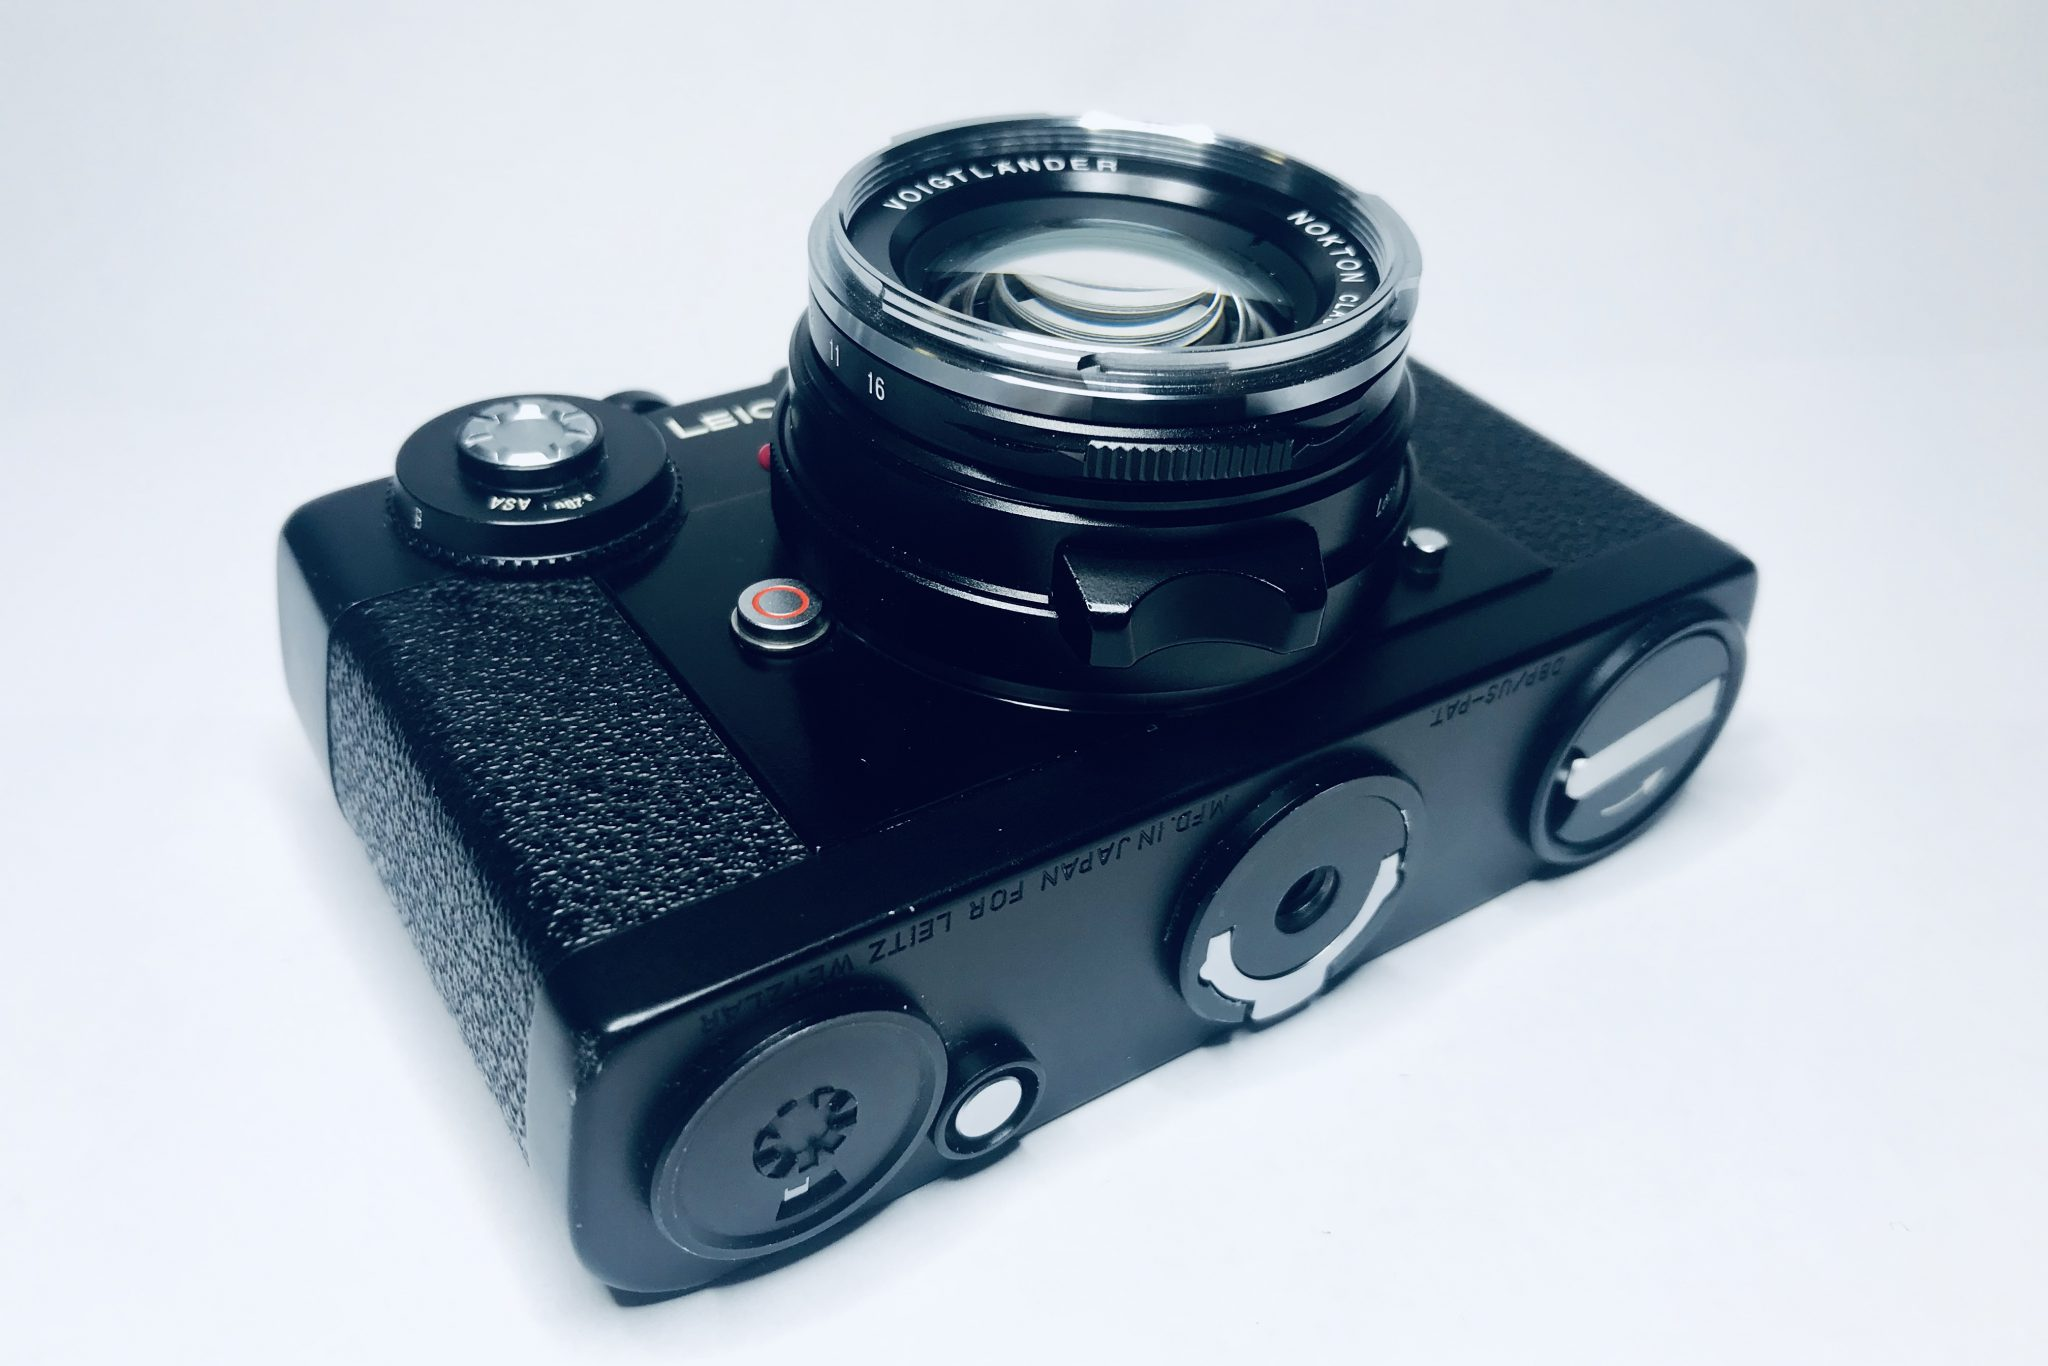 Leica CL Film